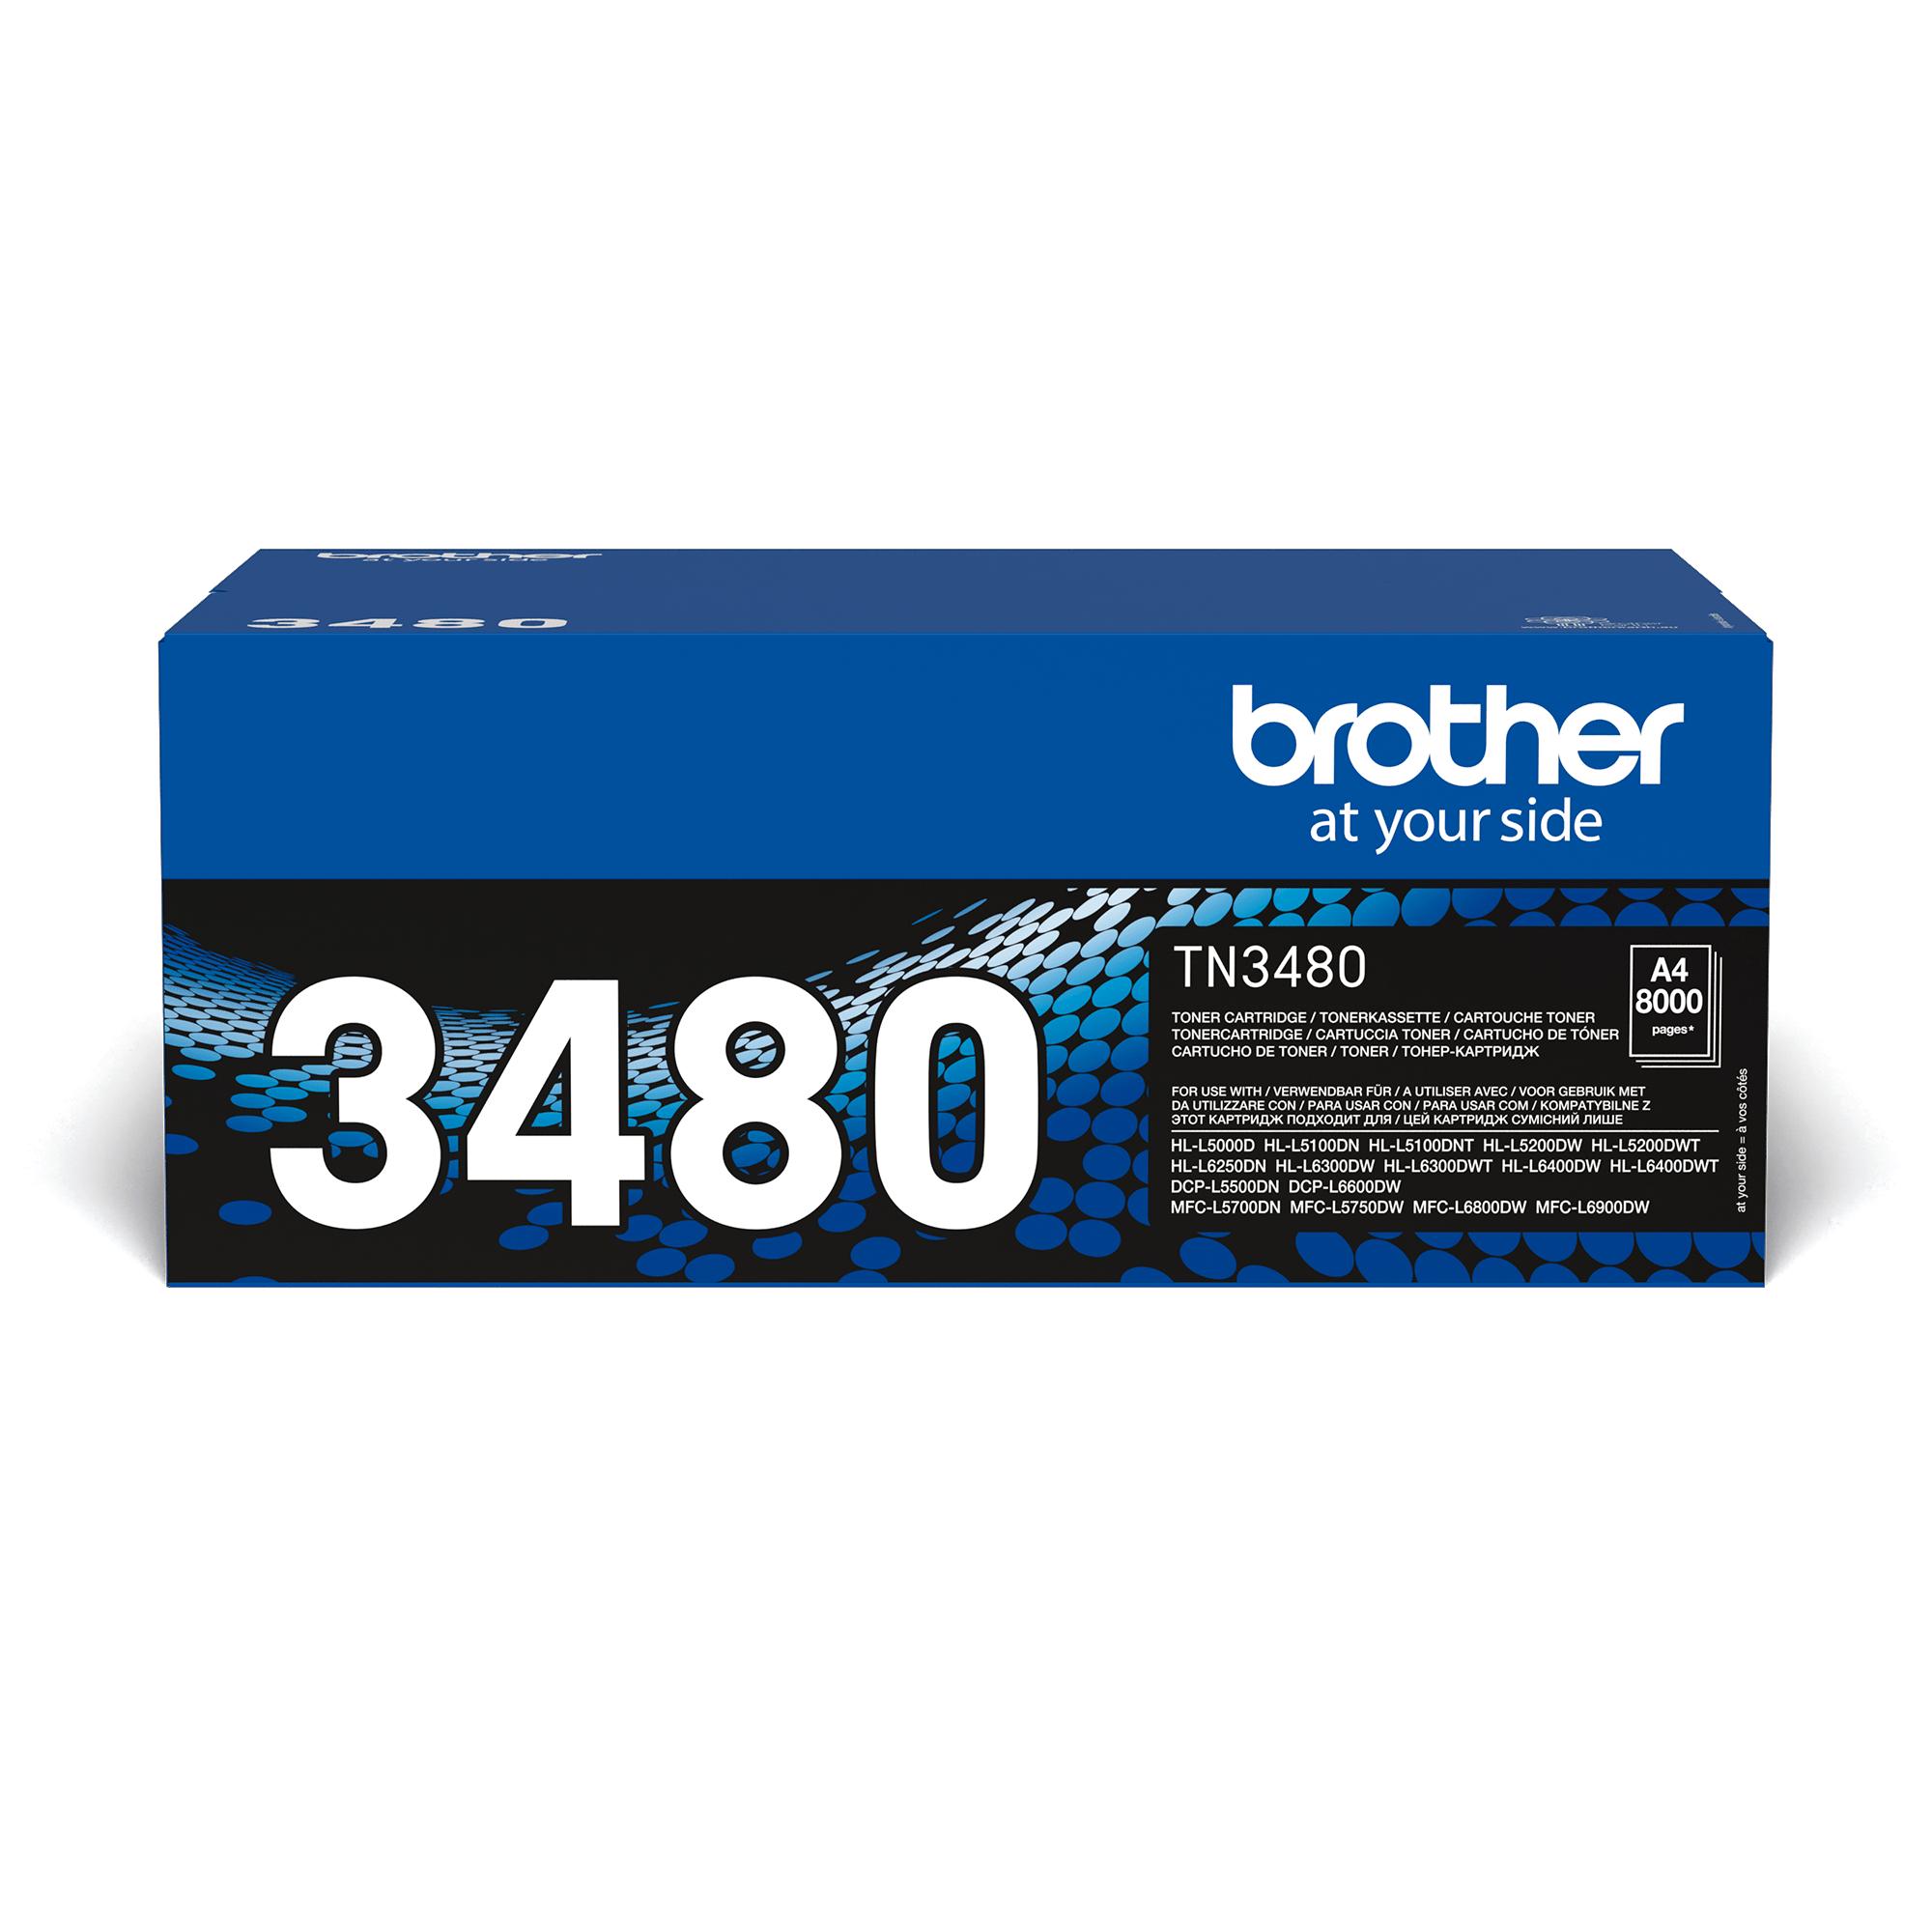 Brother TN-3480 Tonerkartusche – Schwarz 2